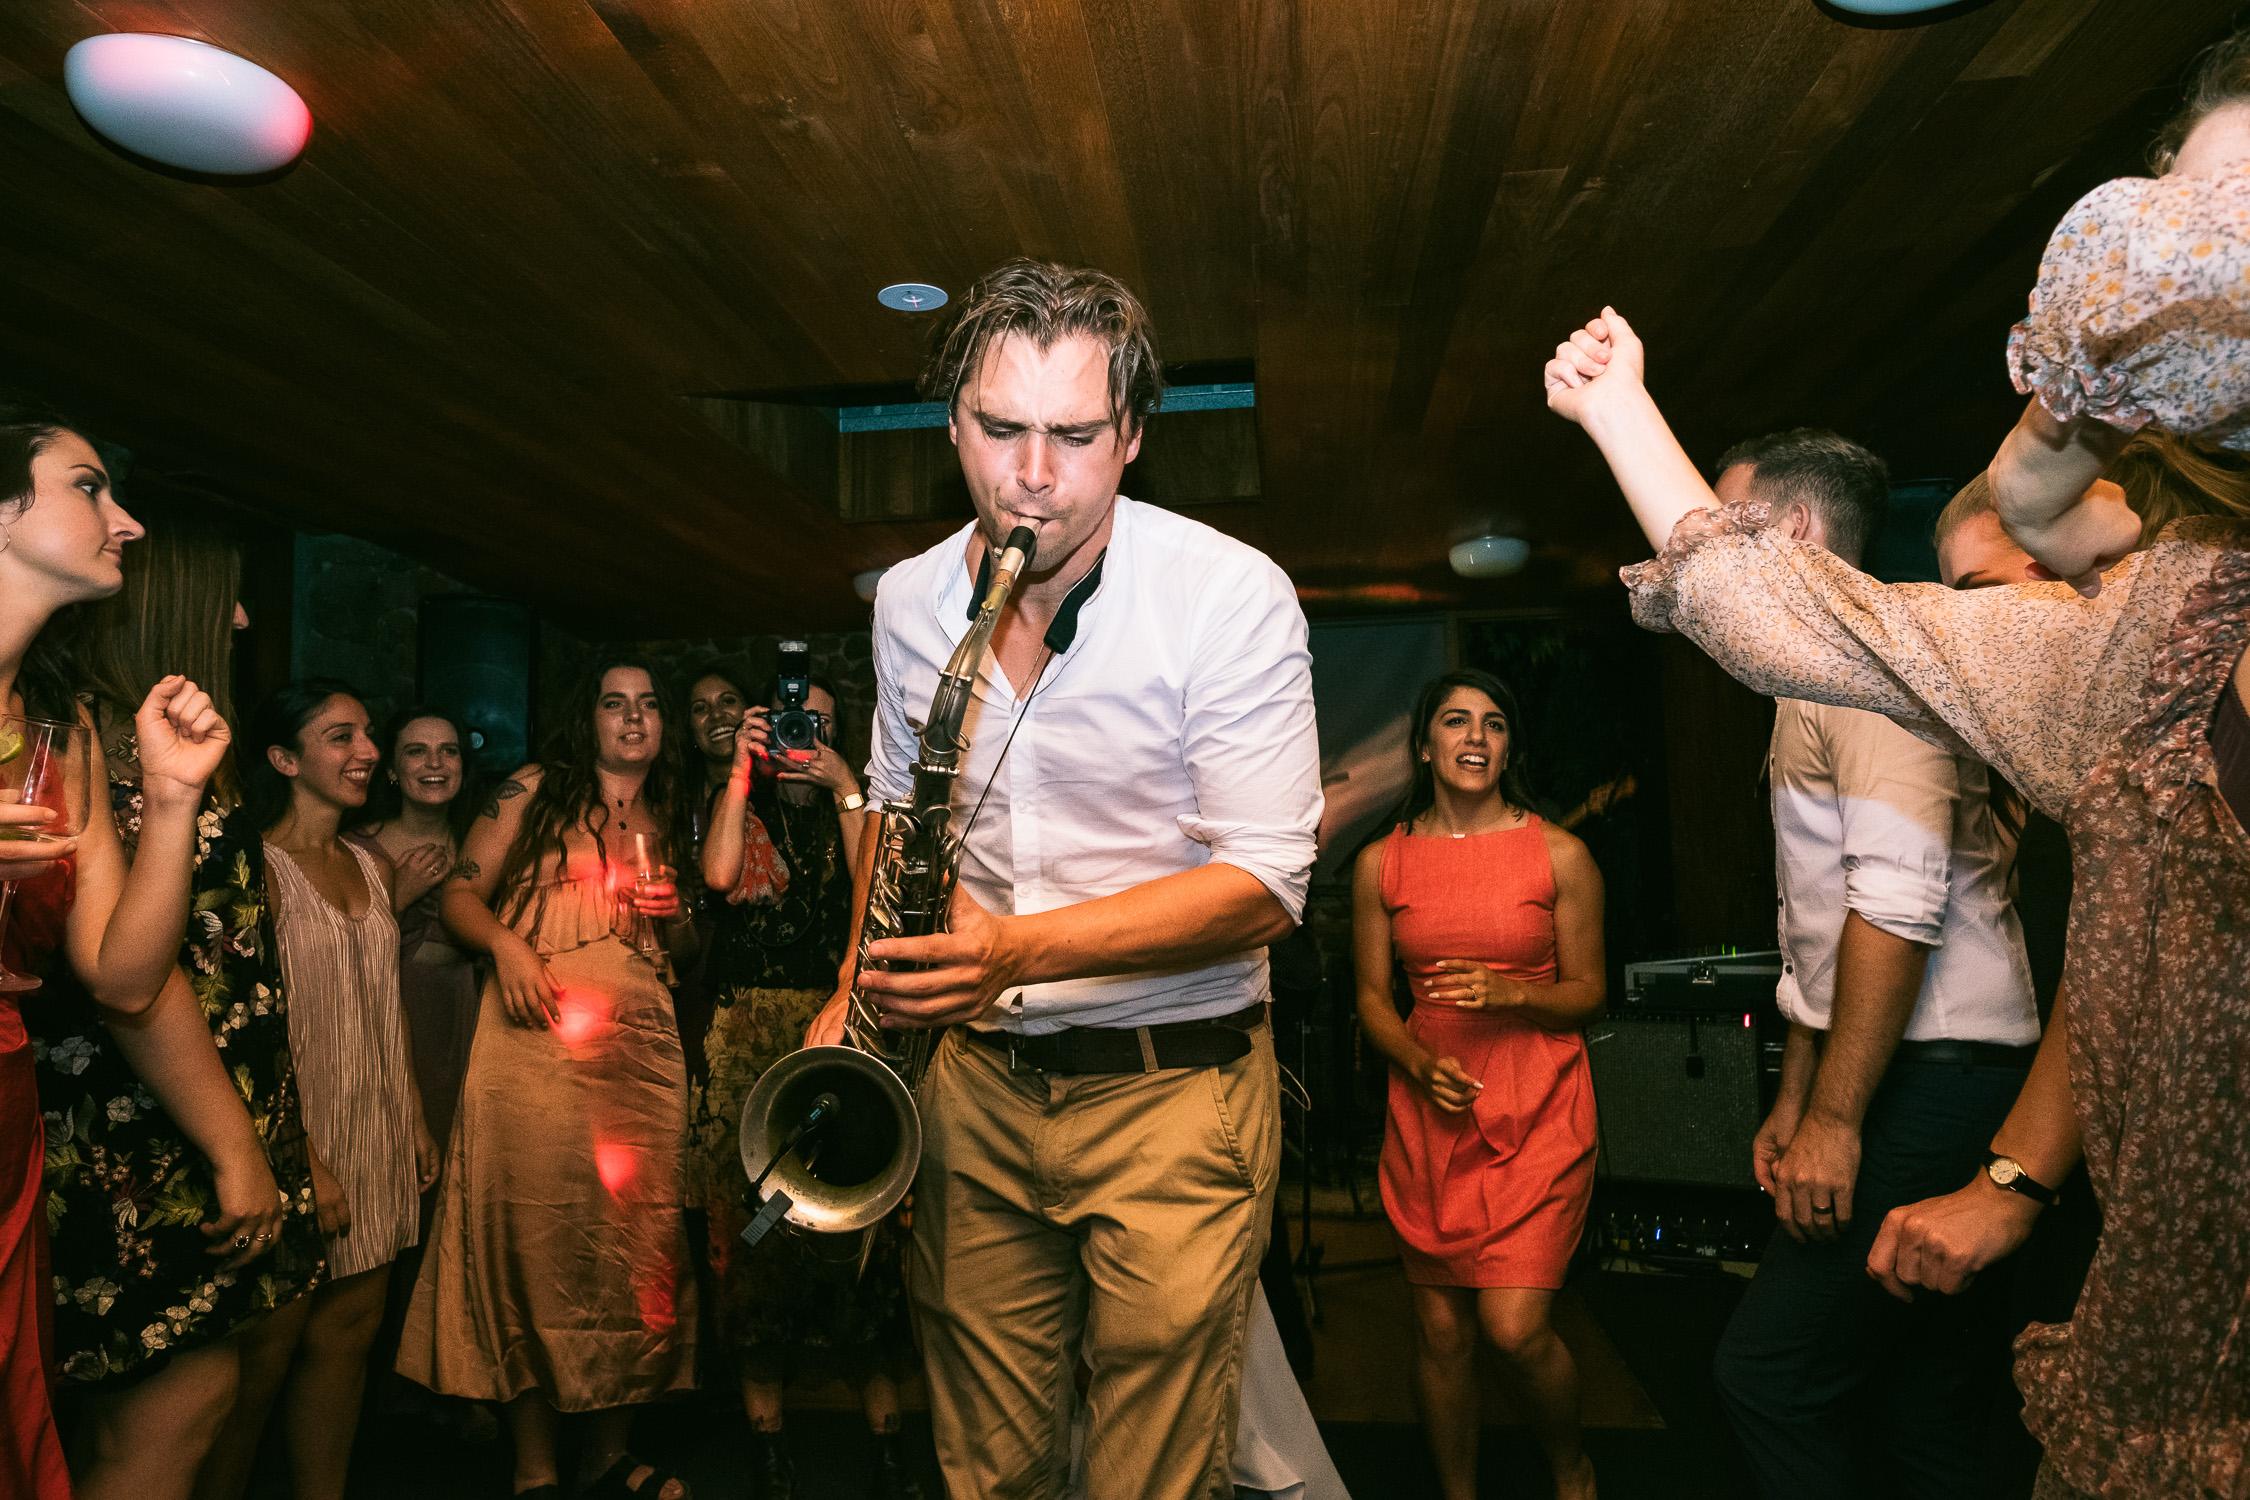 Melbourne Sunnystones Camp Wedding - band saxophone player on dancefloor